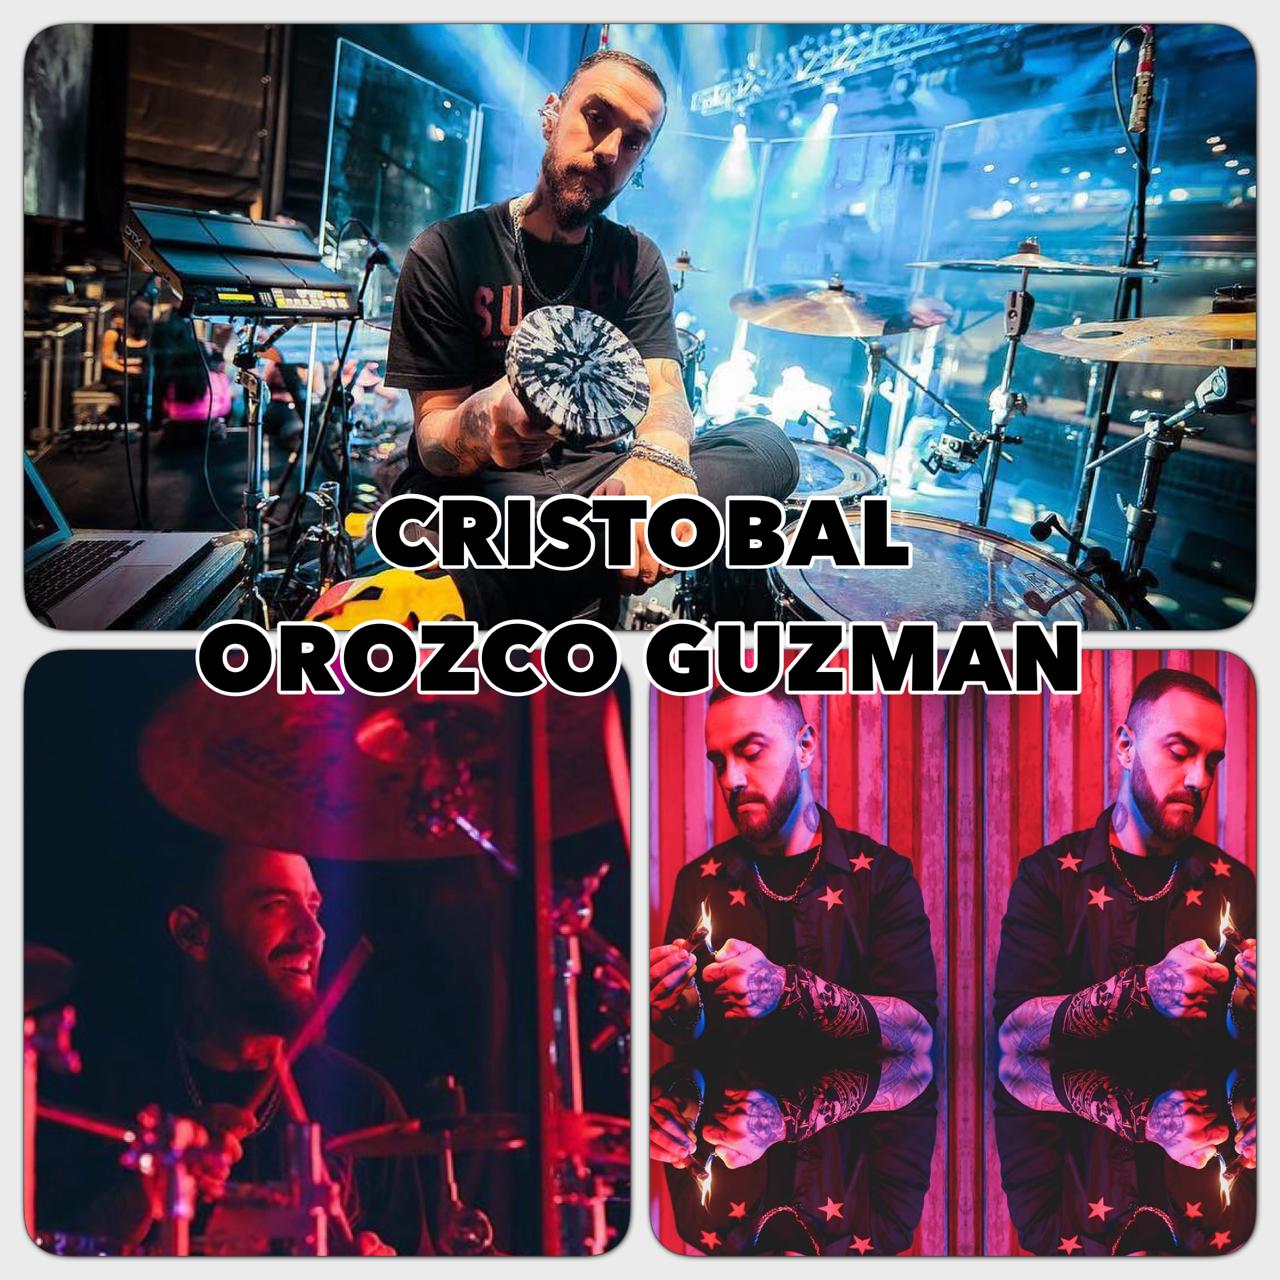 CRISTOBAL OROZCO GUZMAN